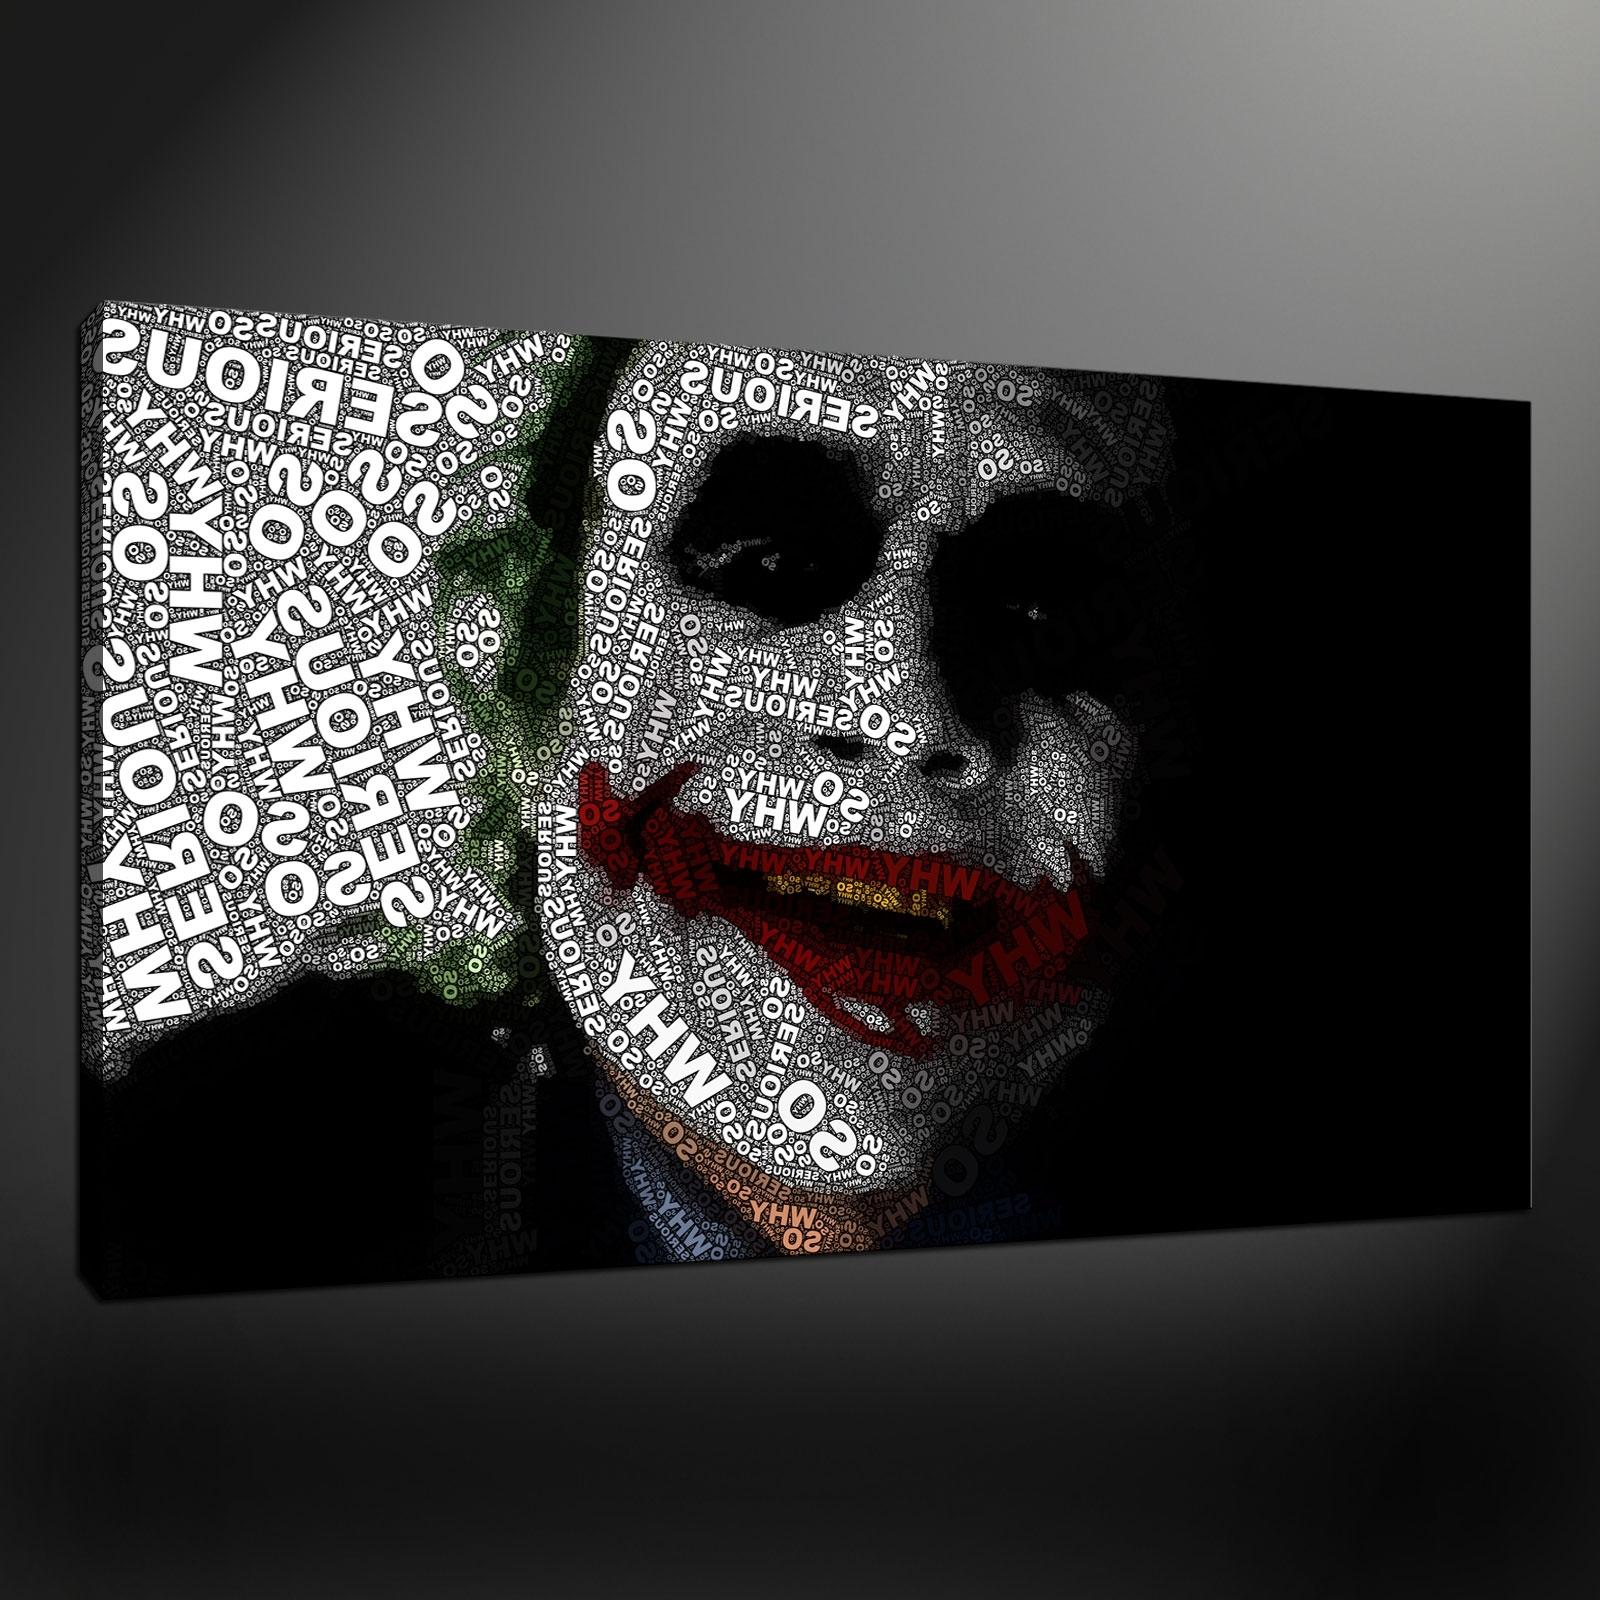 Well Known Quality Canvas Print Art Regarding Joker Canvas Wall Art (View 14 of 15)